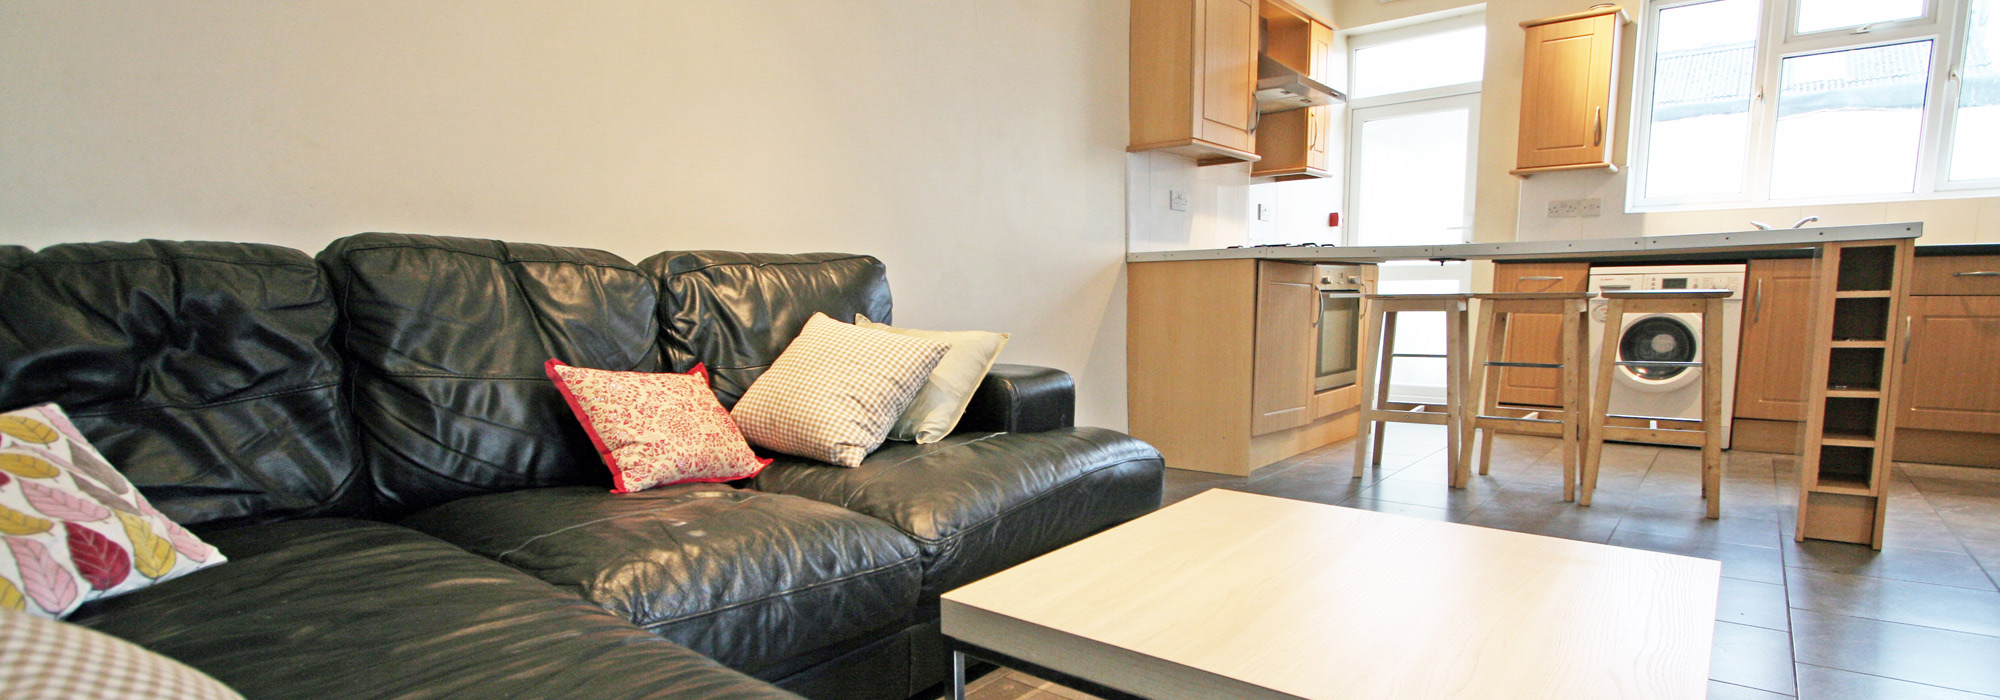 Arabella St, Roath – 6 Bed House